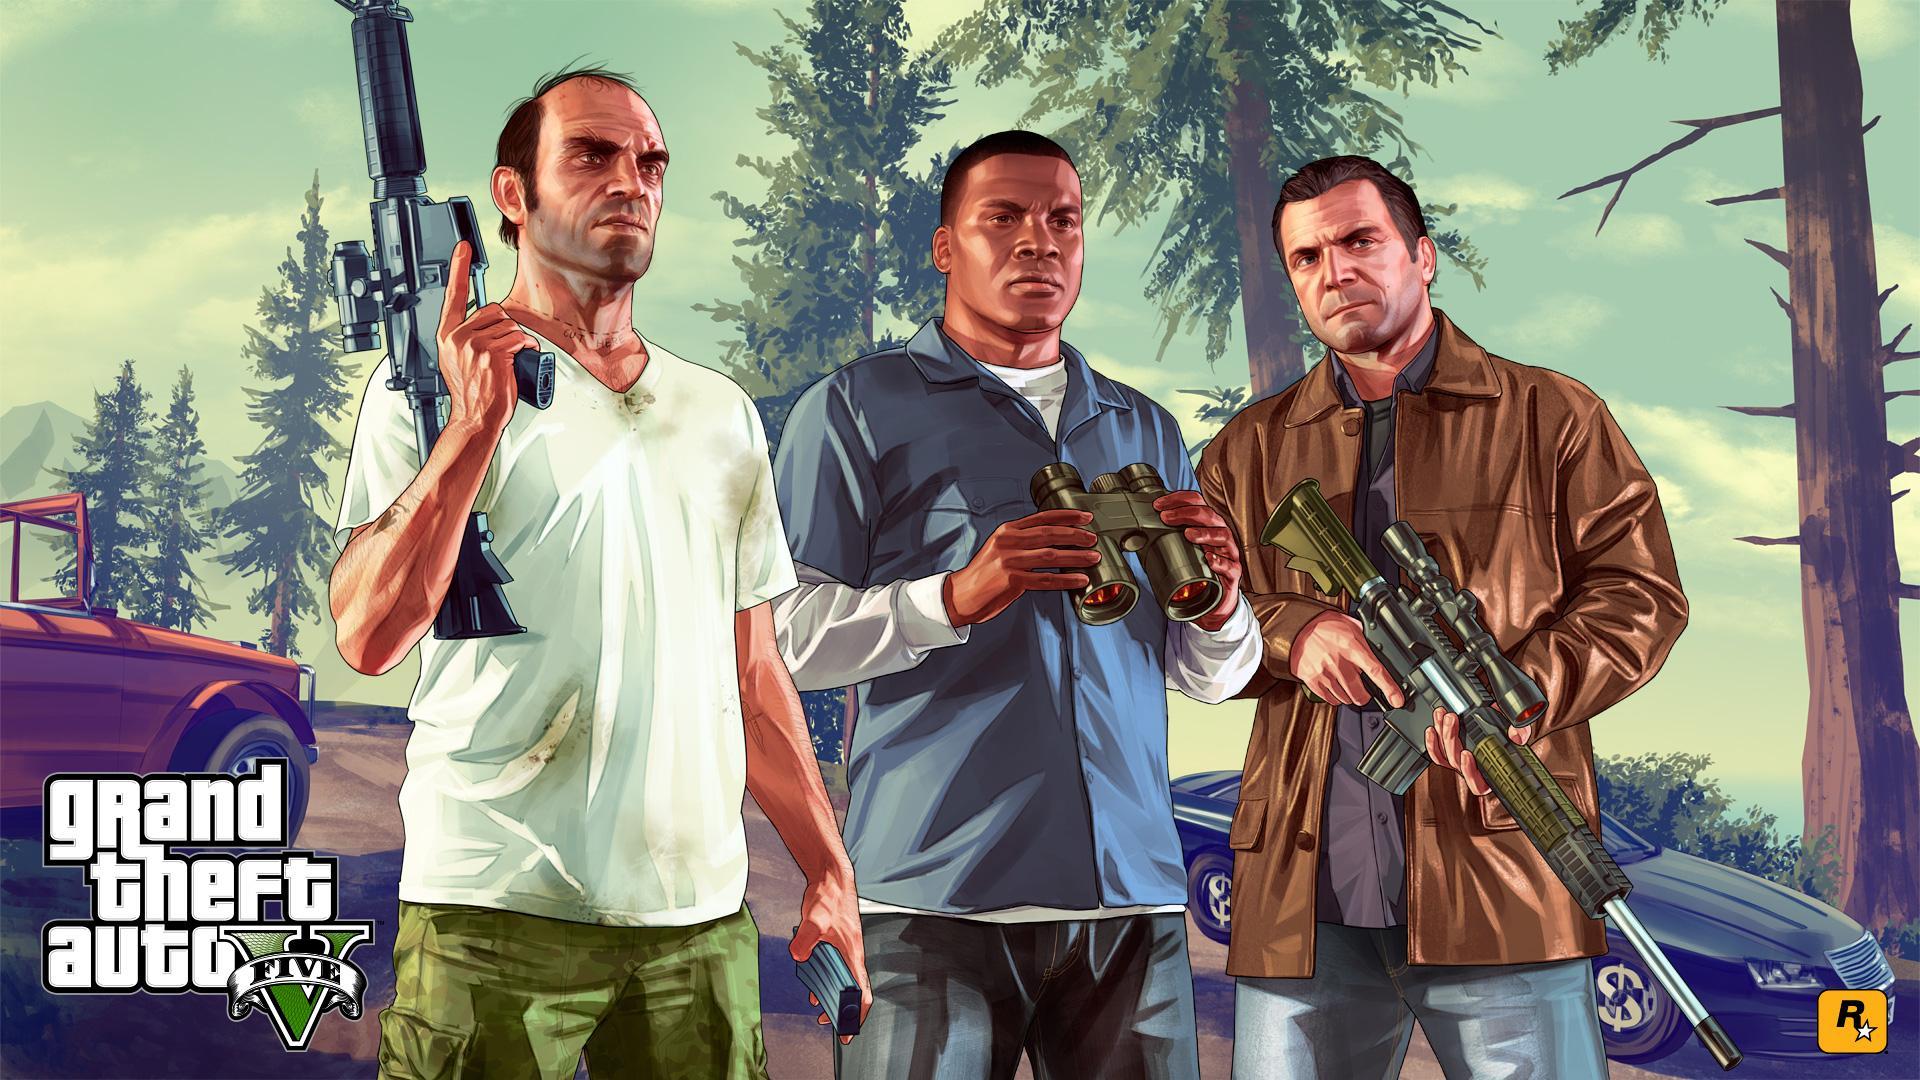 Artistry in Games GTA-V How I Broke GTA V By Being Sane Opinion  V Theft GTA V gta Grand Auto